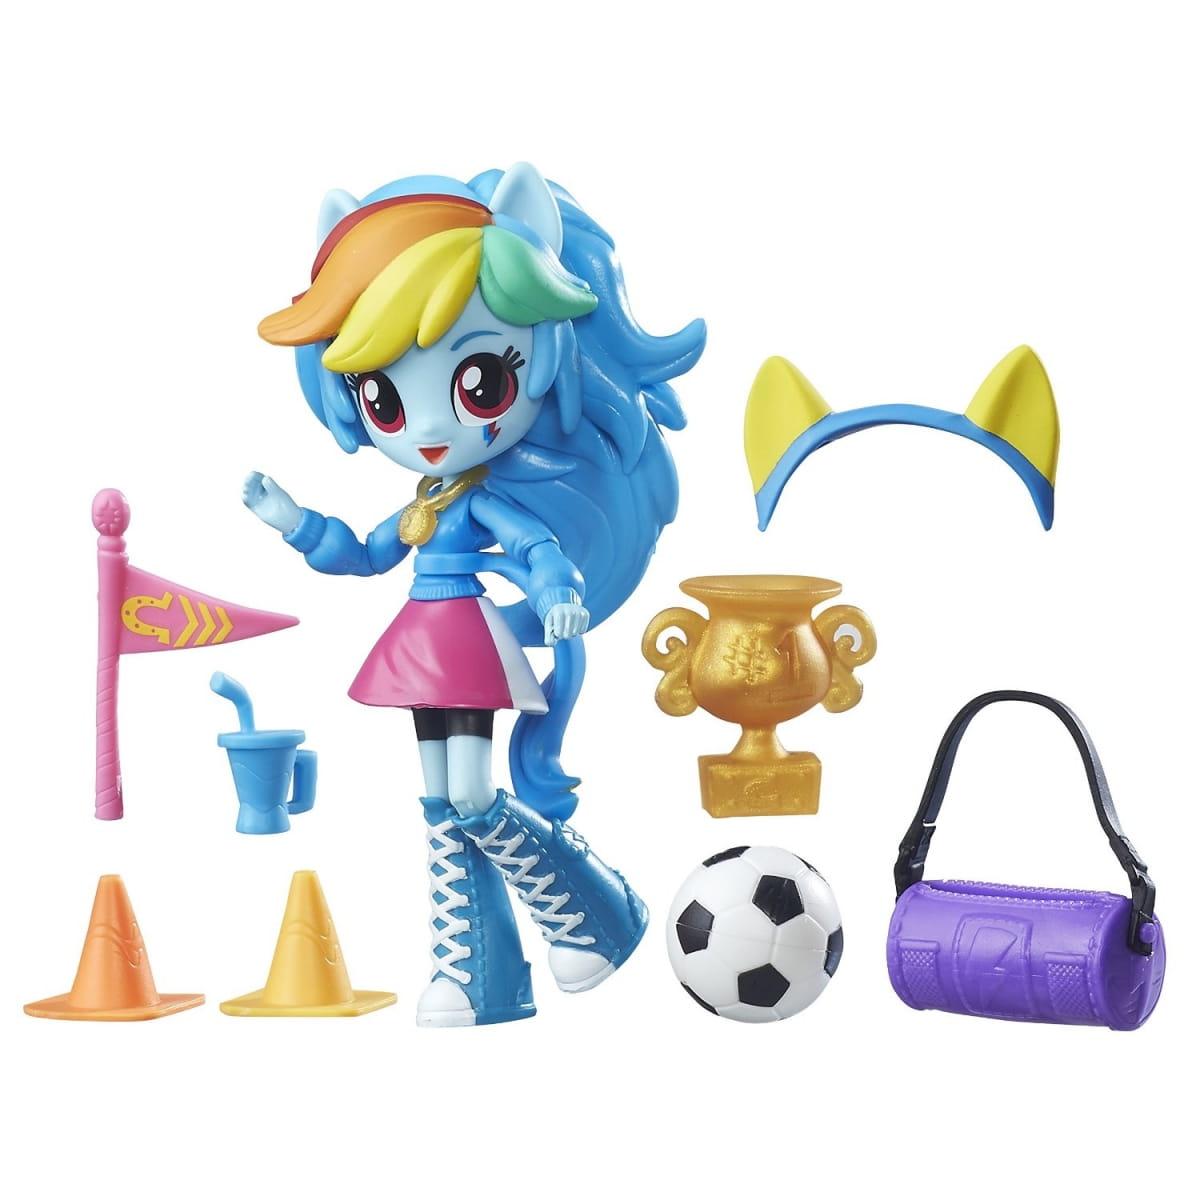 Игровой набор My Little Pony Equestria Girls Рэйнбоу Дэш Rainbow Dash (HASBRO) - My Little Pony